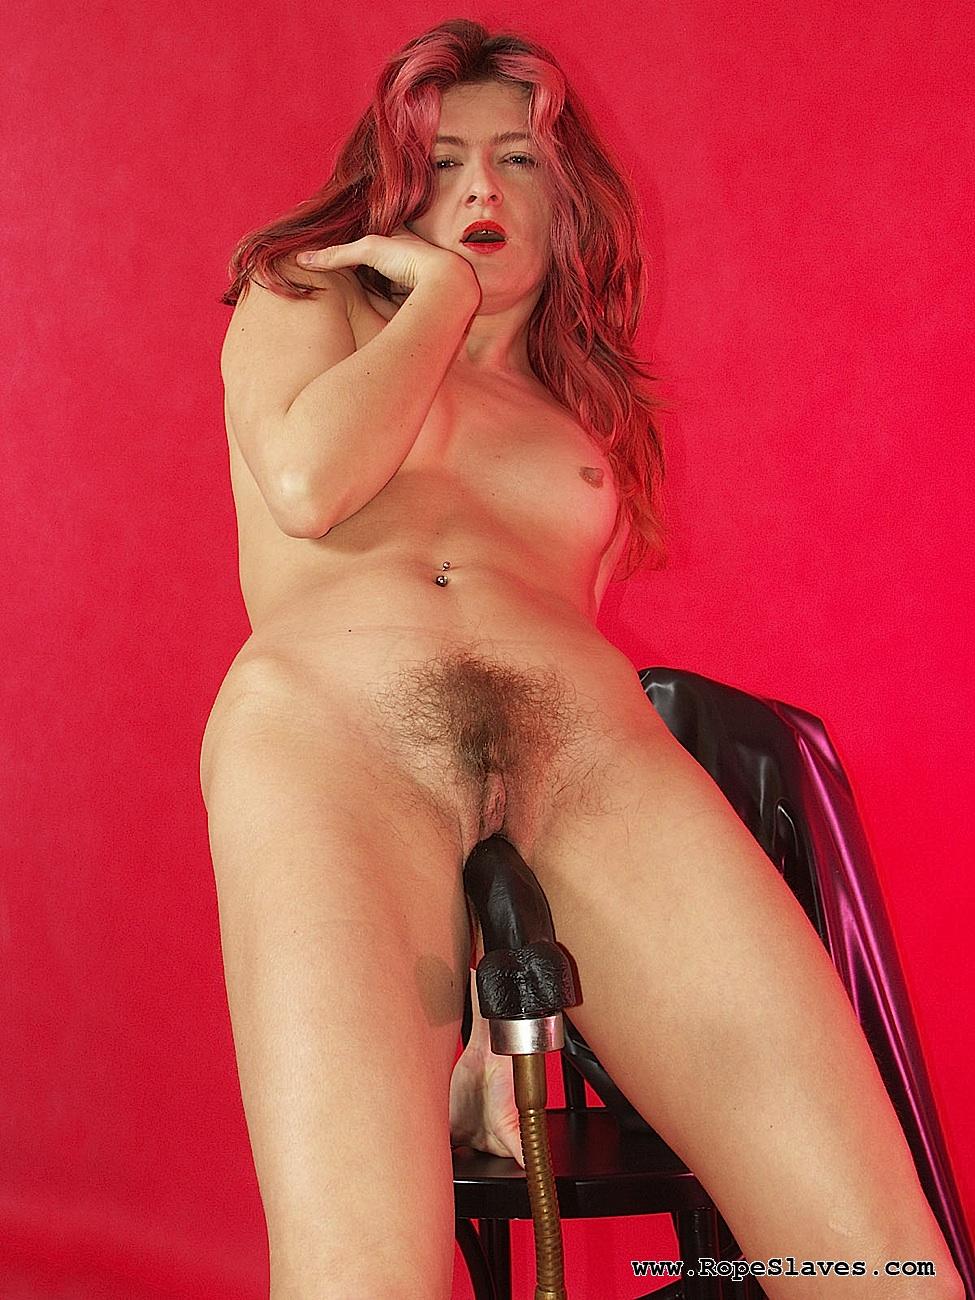 Valuable Skye model nude porn